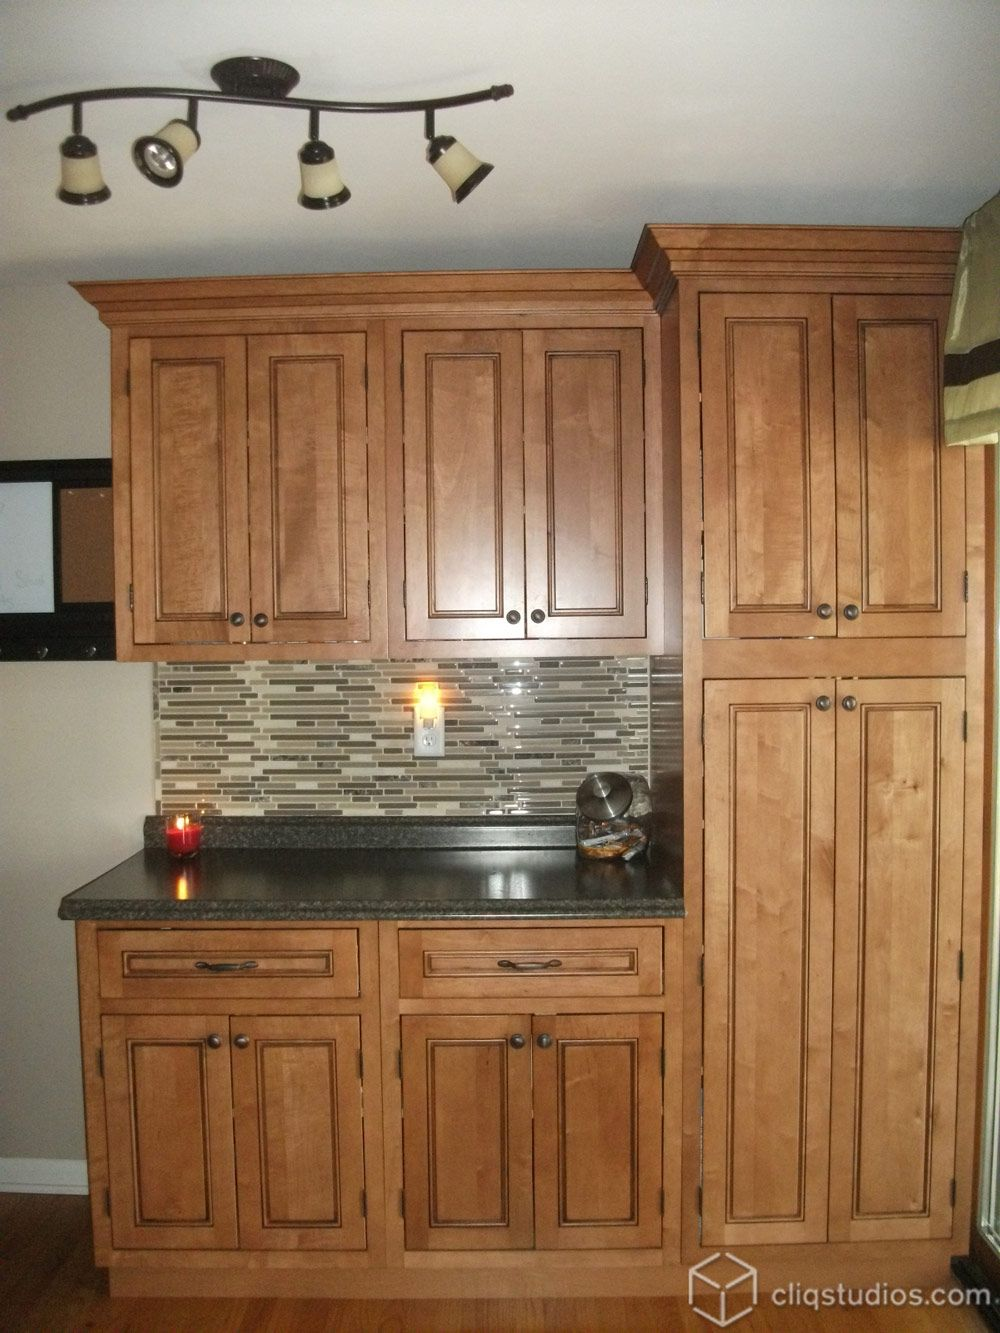 Fairmont Inset Kitchen Cabinets In Maple Caramel Jute Glaze From Cliqstudios Com Kitchen Remodel Kitchen Design Custom Kitchens